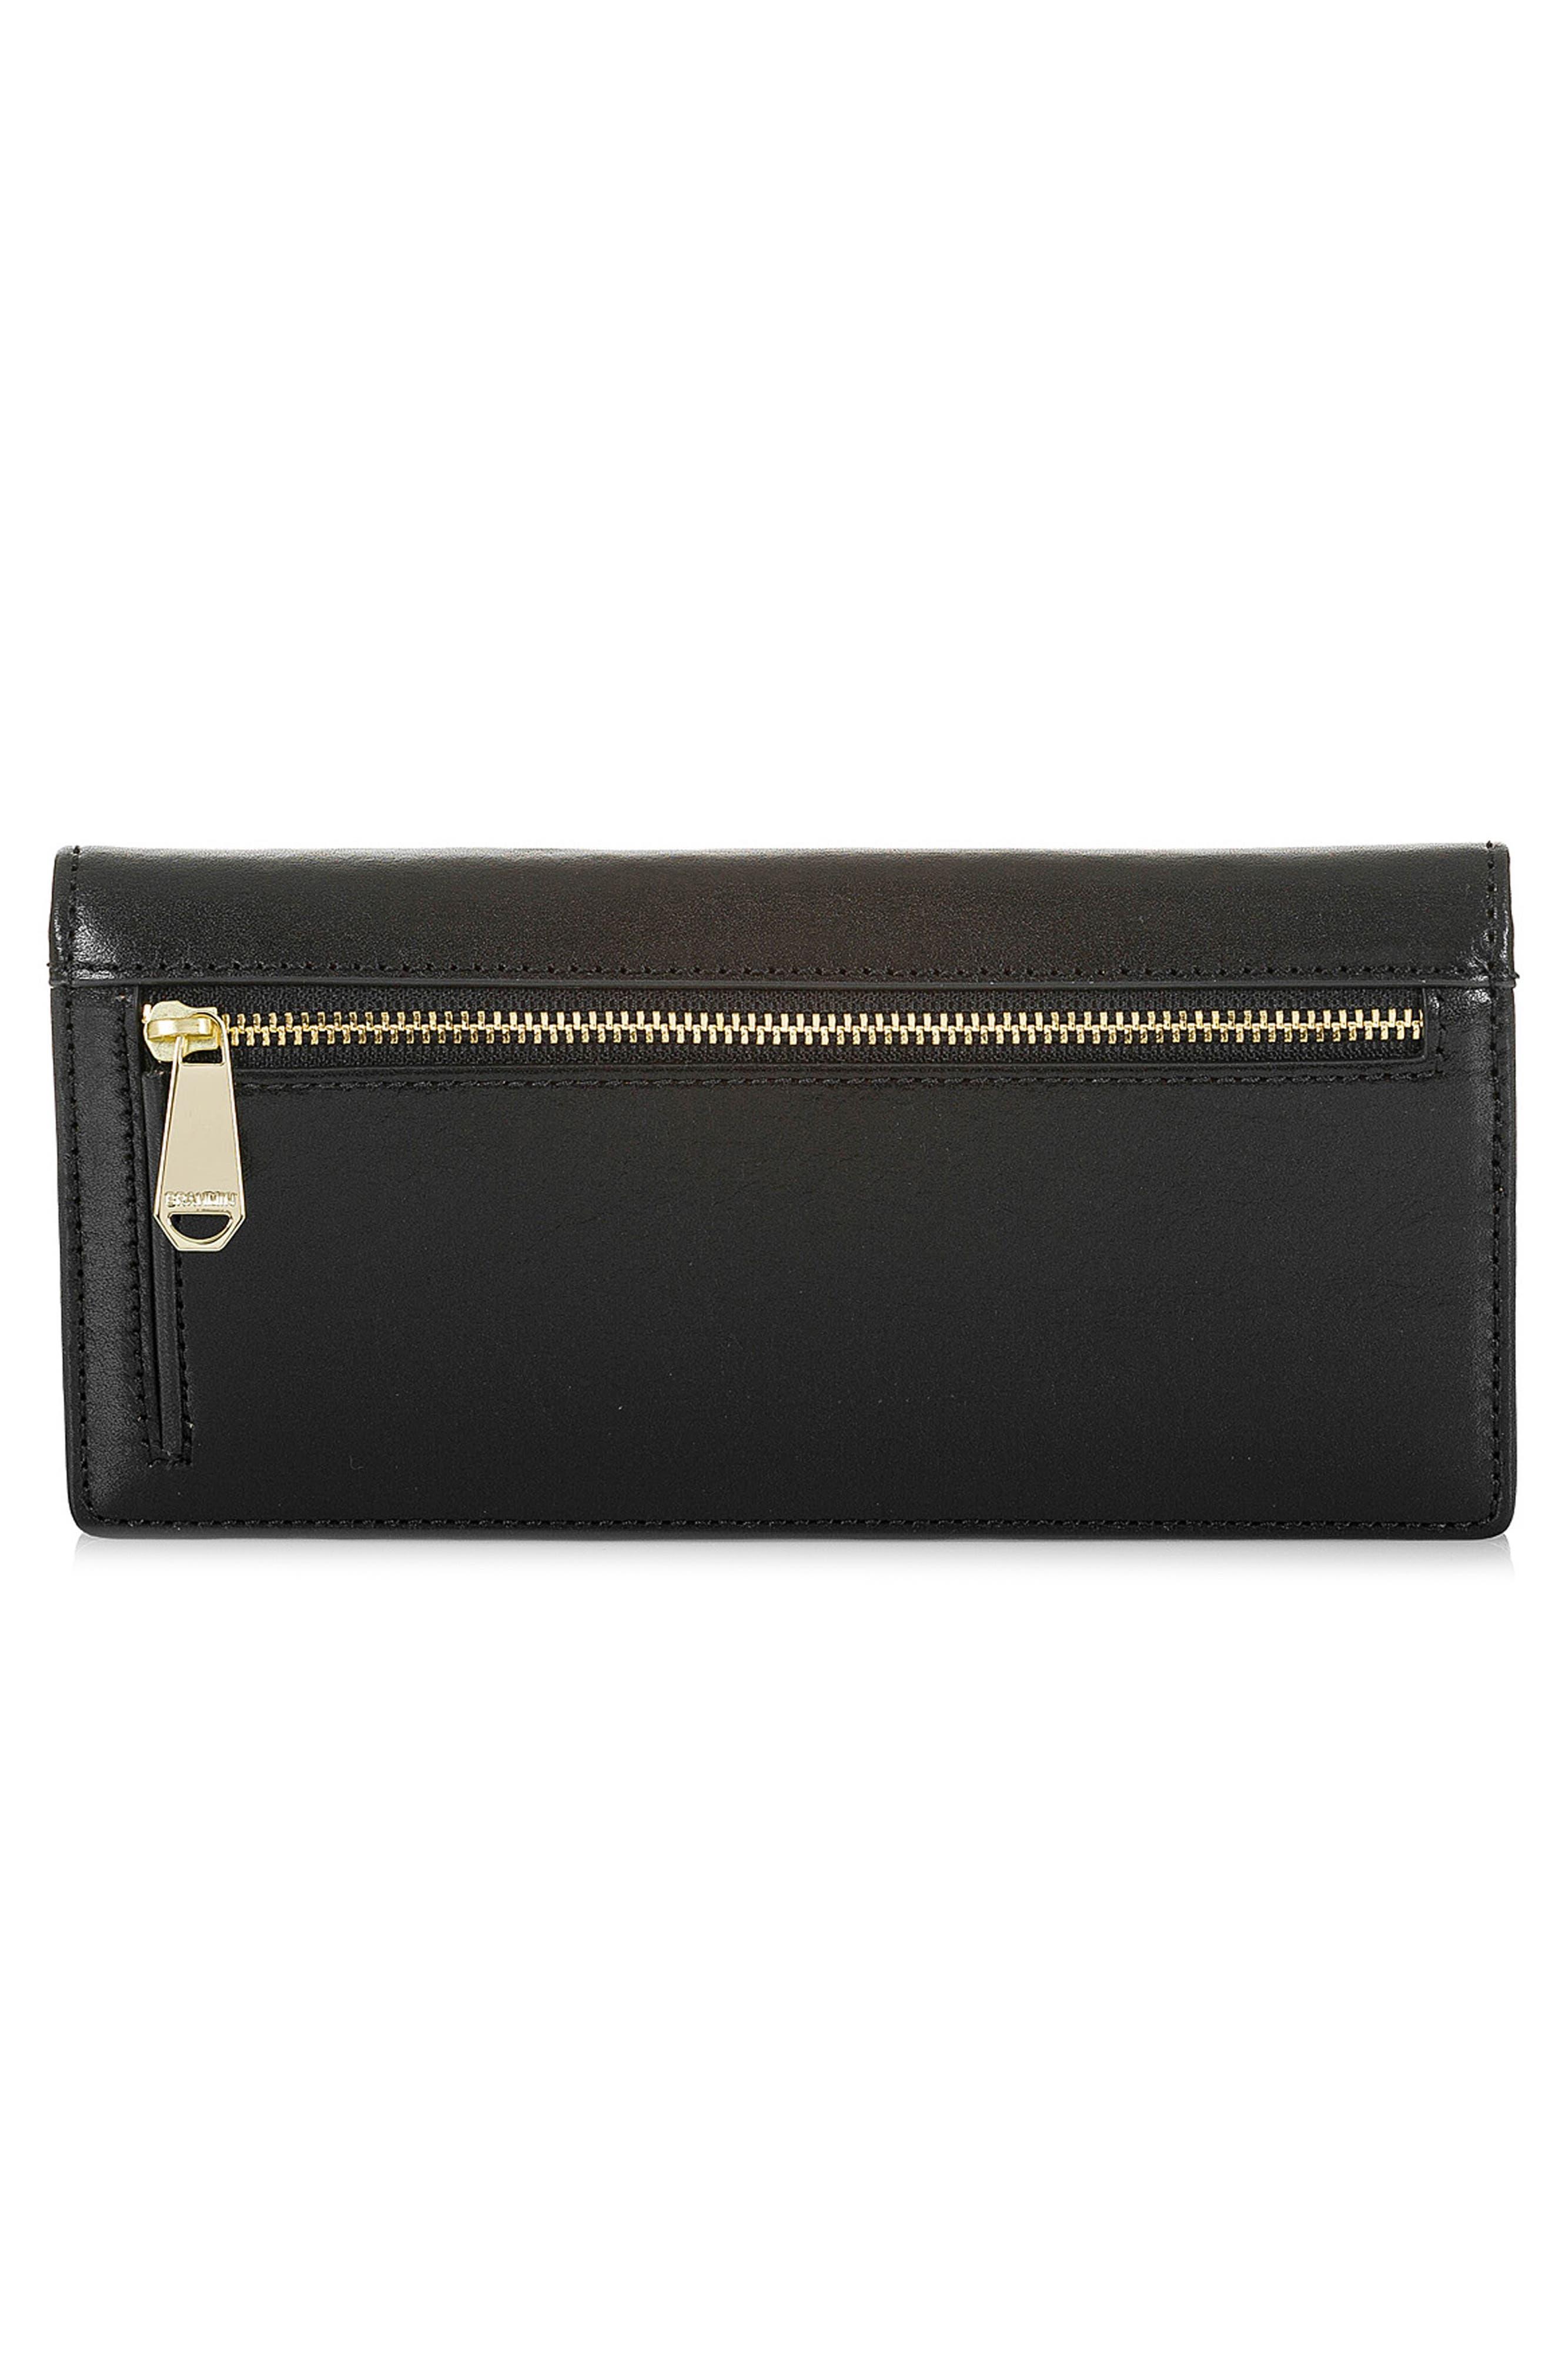 BRAHMIN, Ady Leather Wallet, Alternate thumbnail 3, color, 001